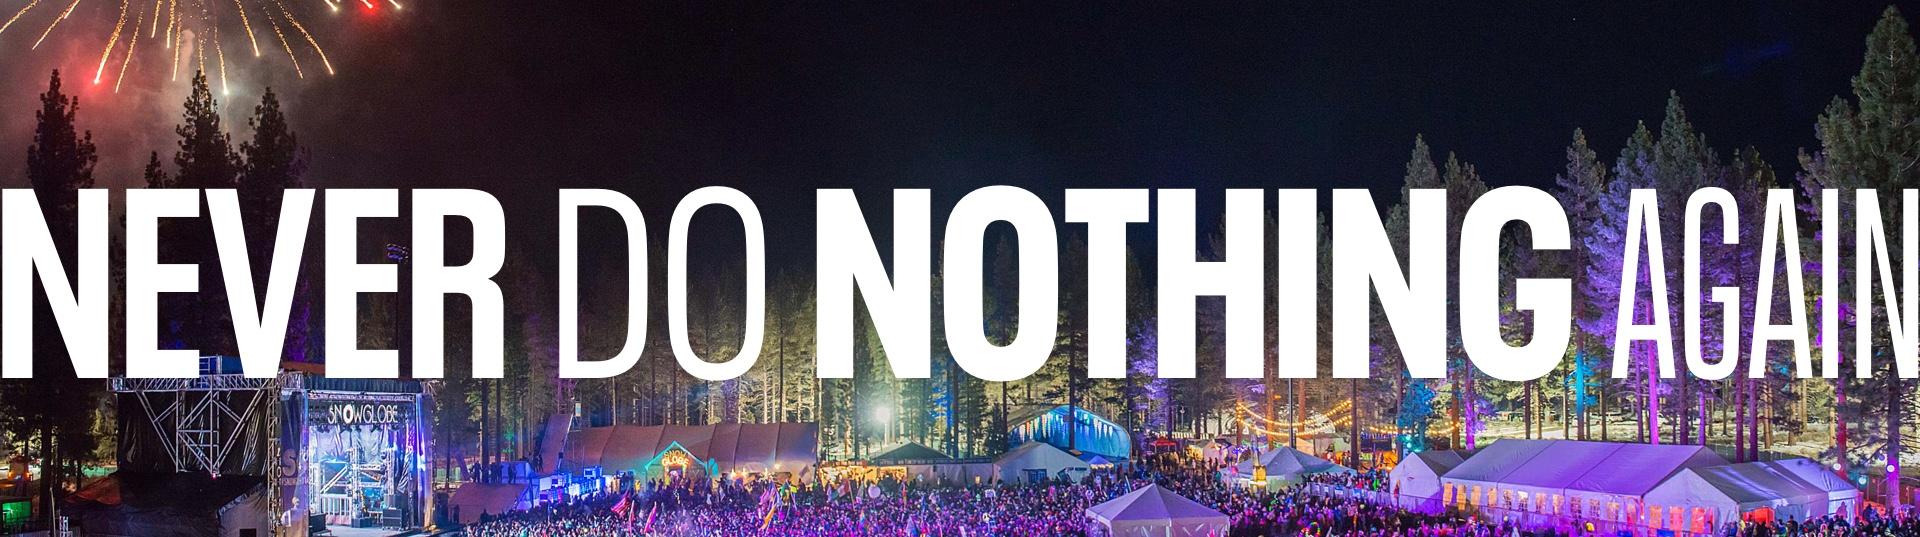 SnowGlobe Music Festival,South Lake Tahoe,CA